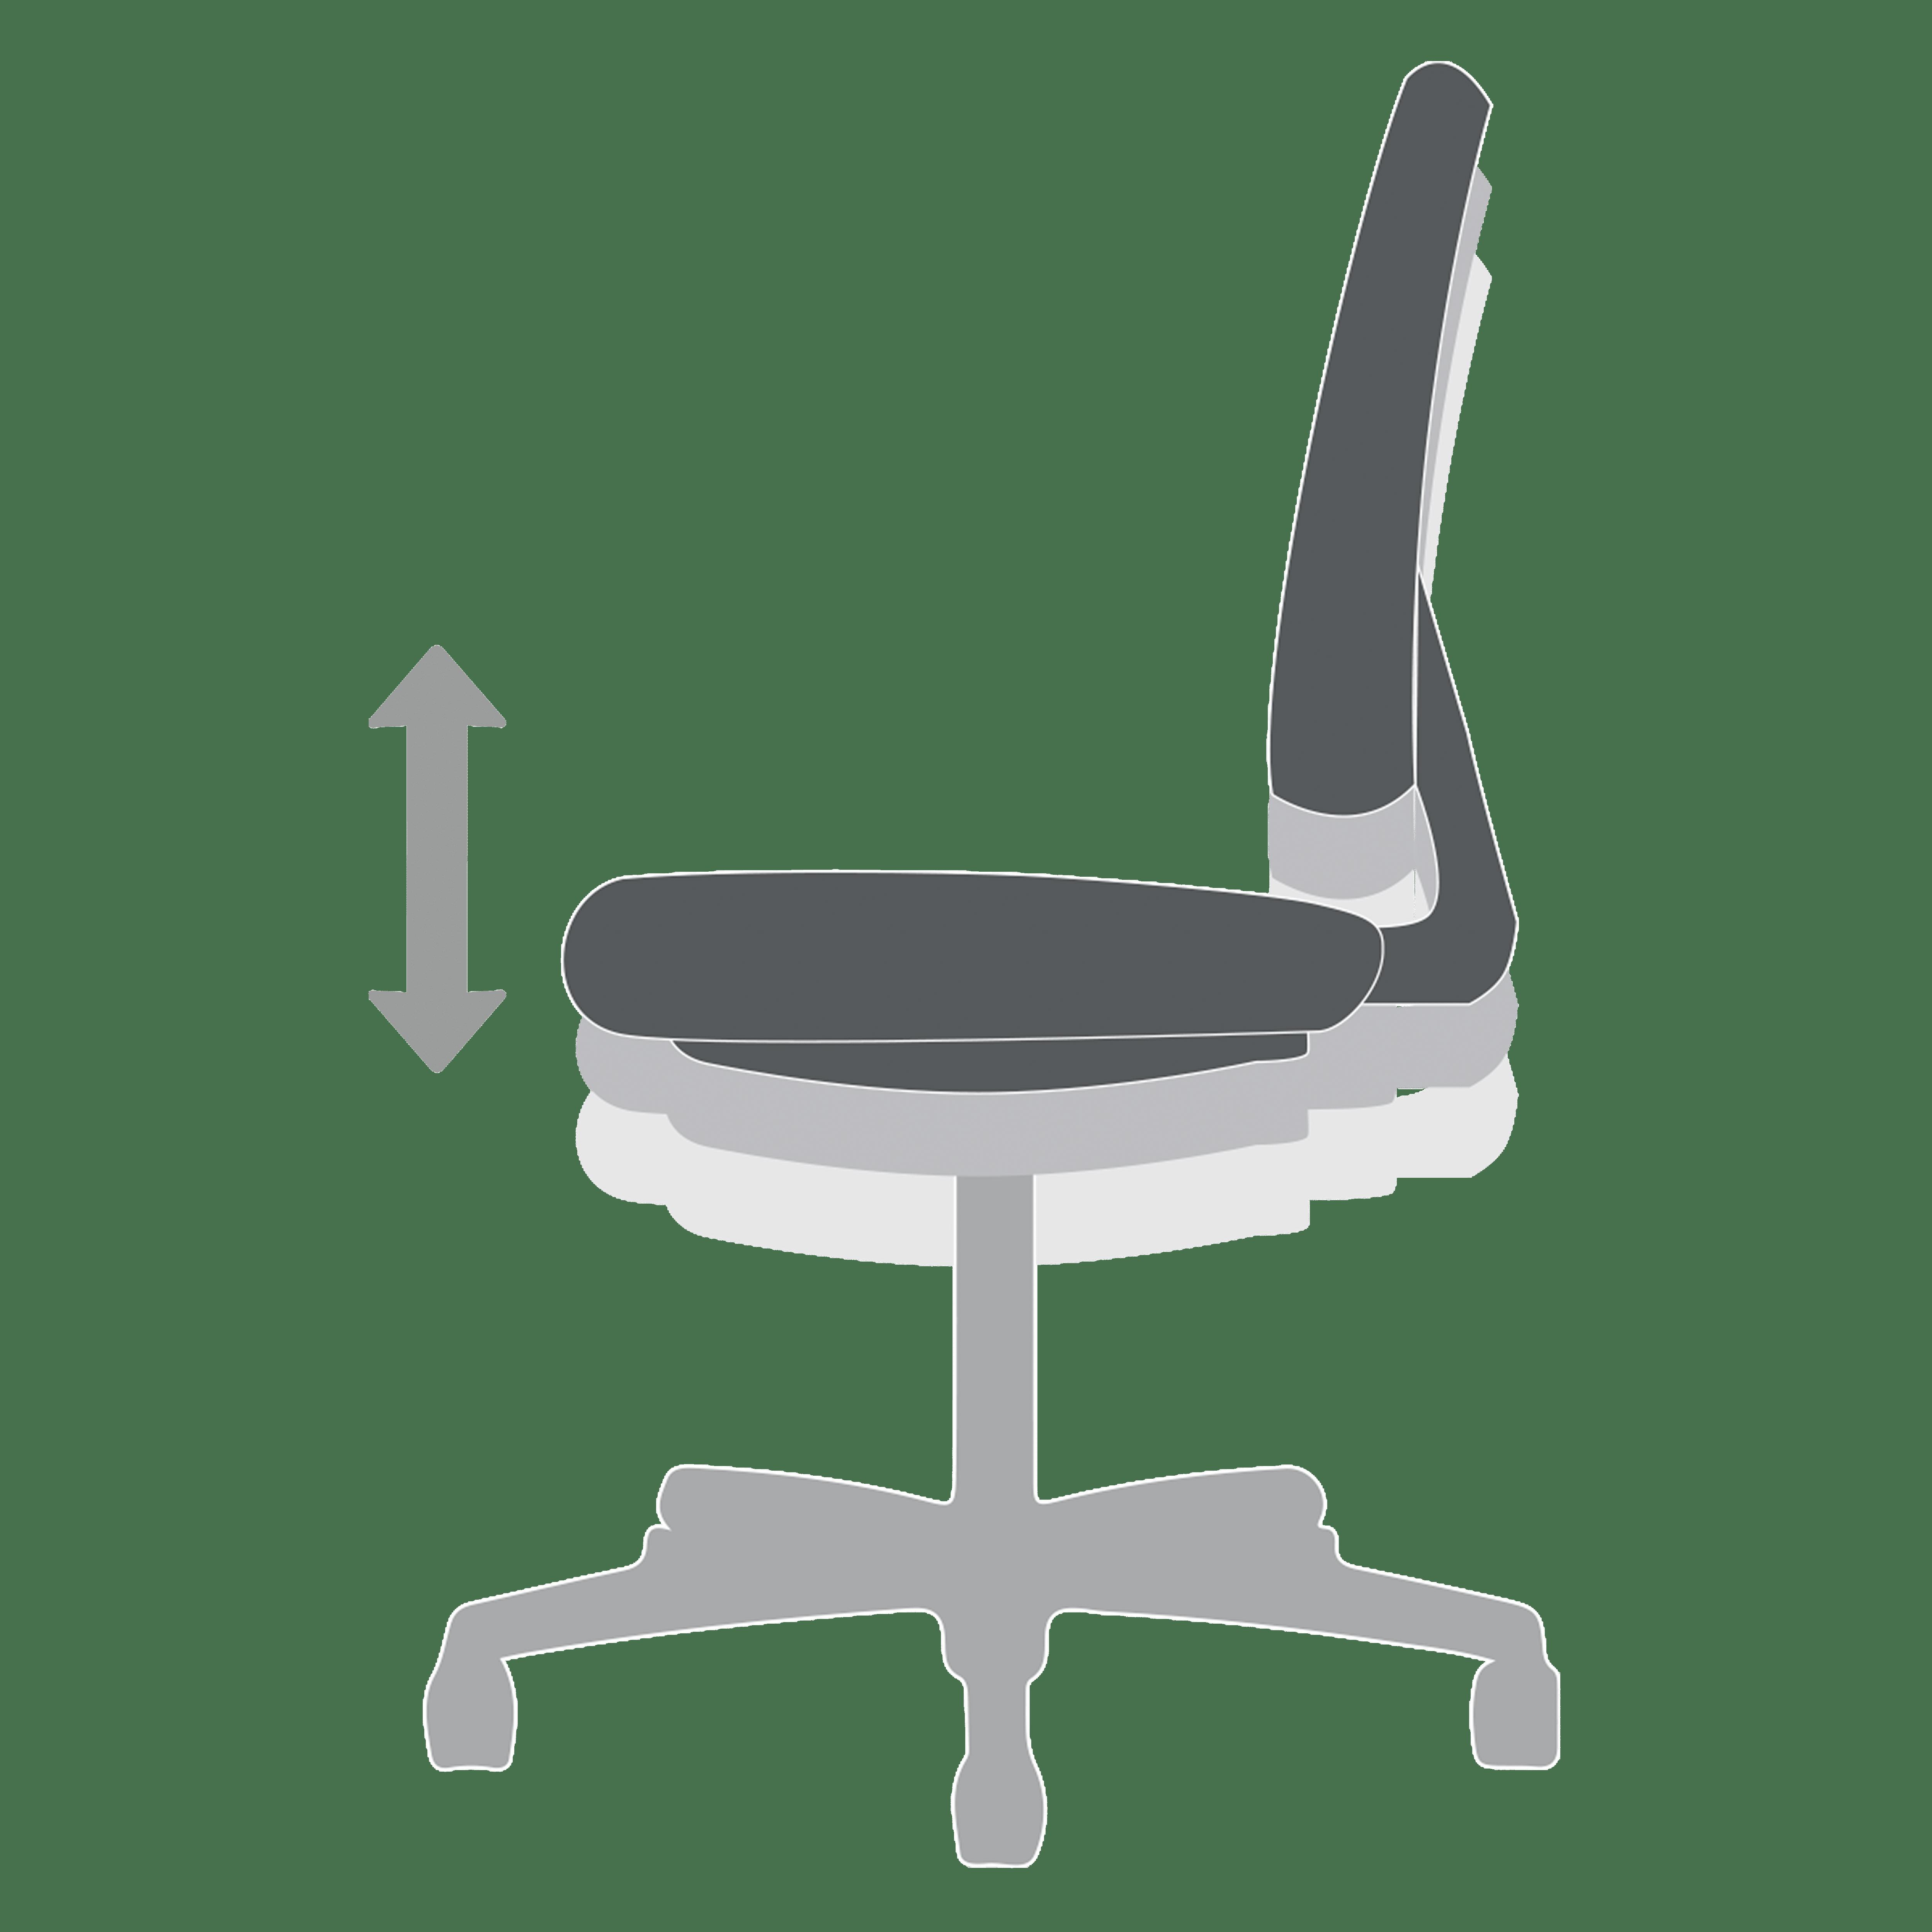 A-Pneumatic-Seat-Height-Adjustment